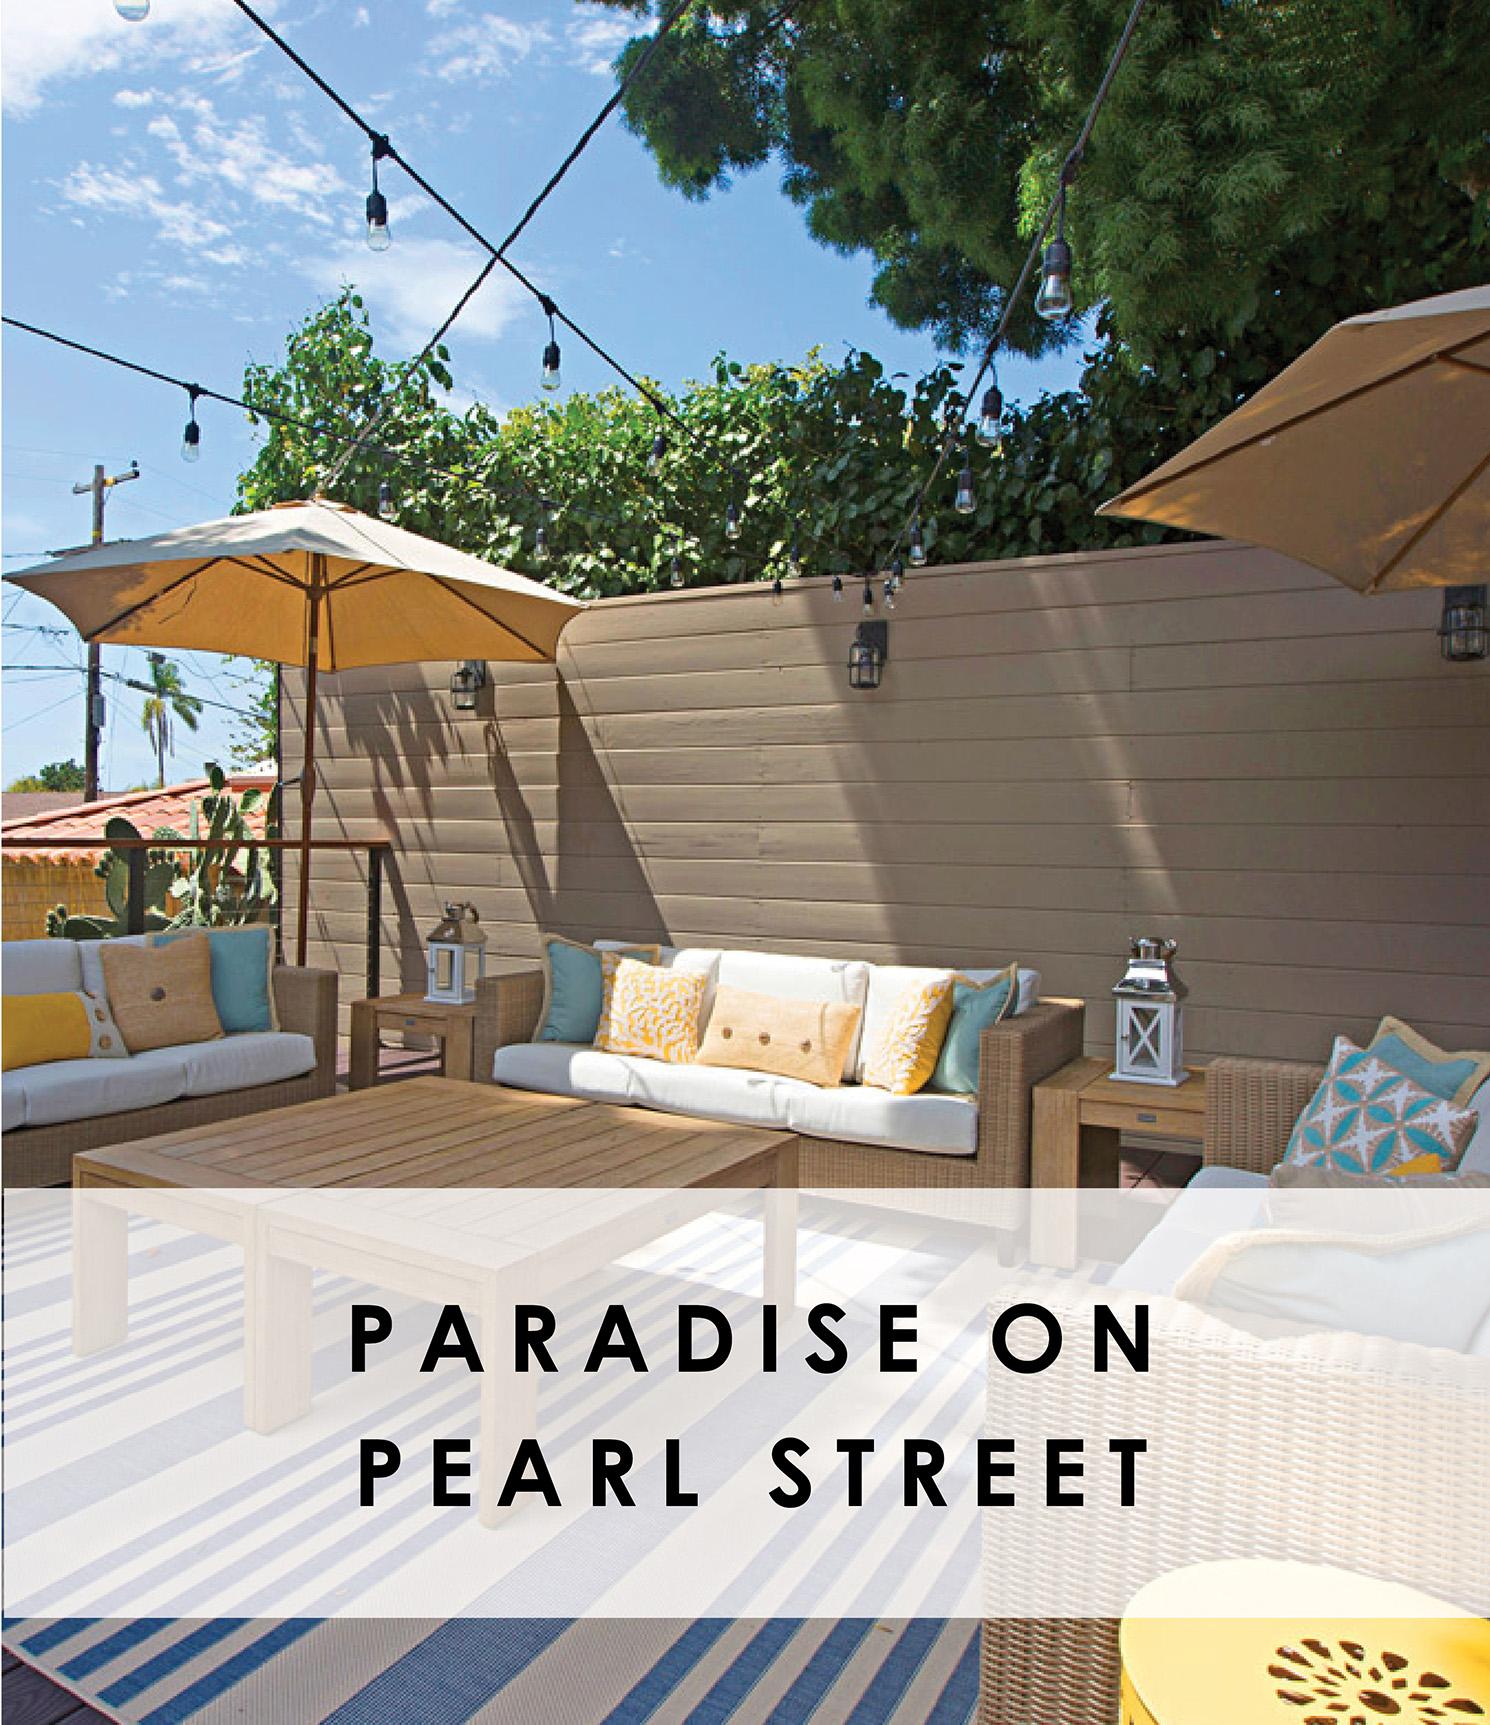 Paradise on Pearl Street_Outdoors.jpg